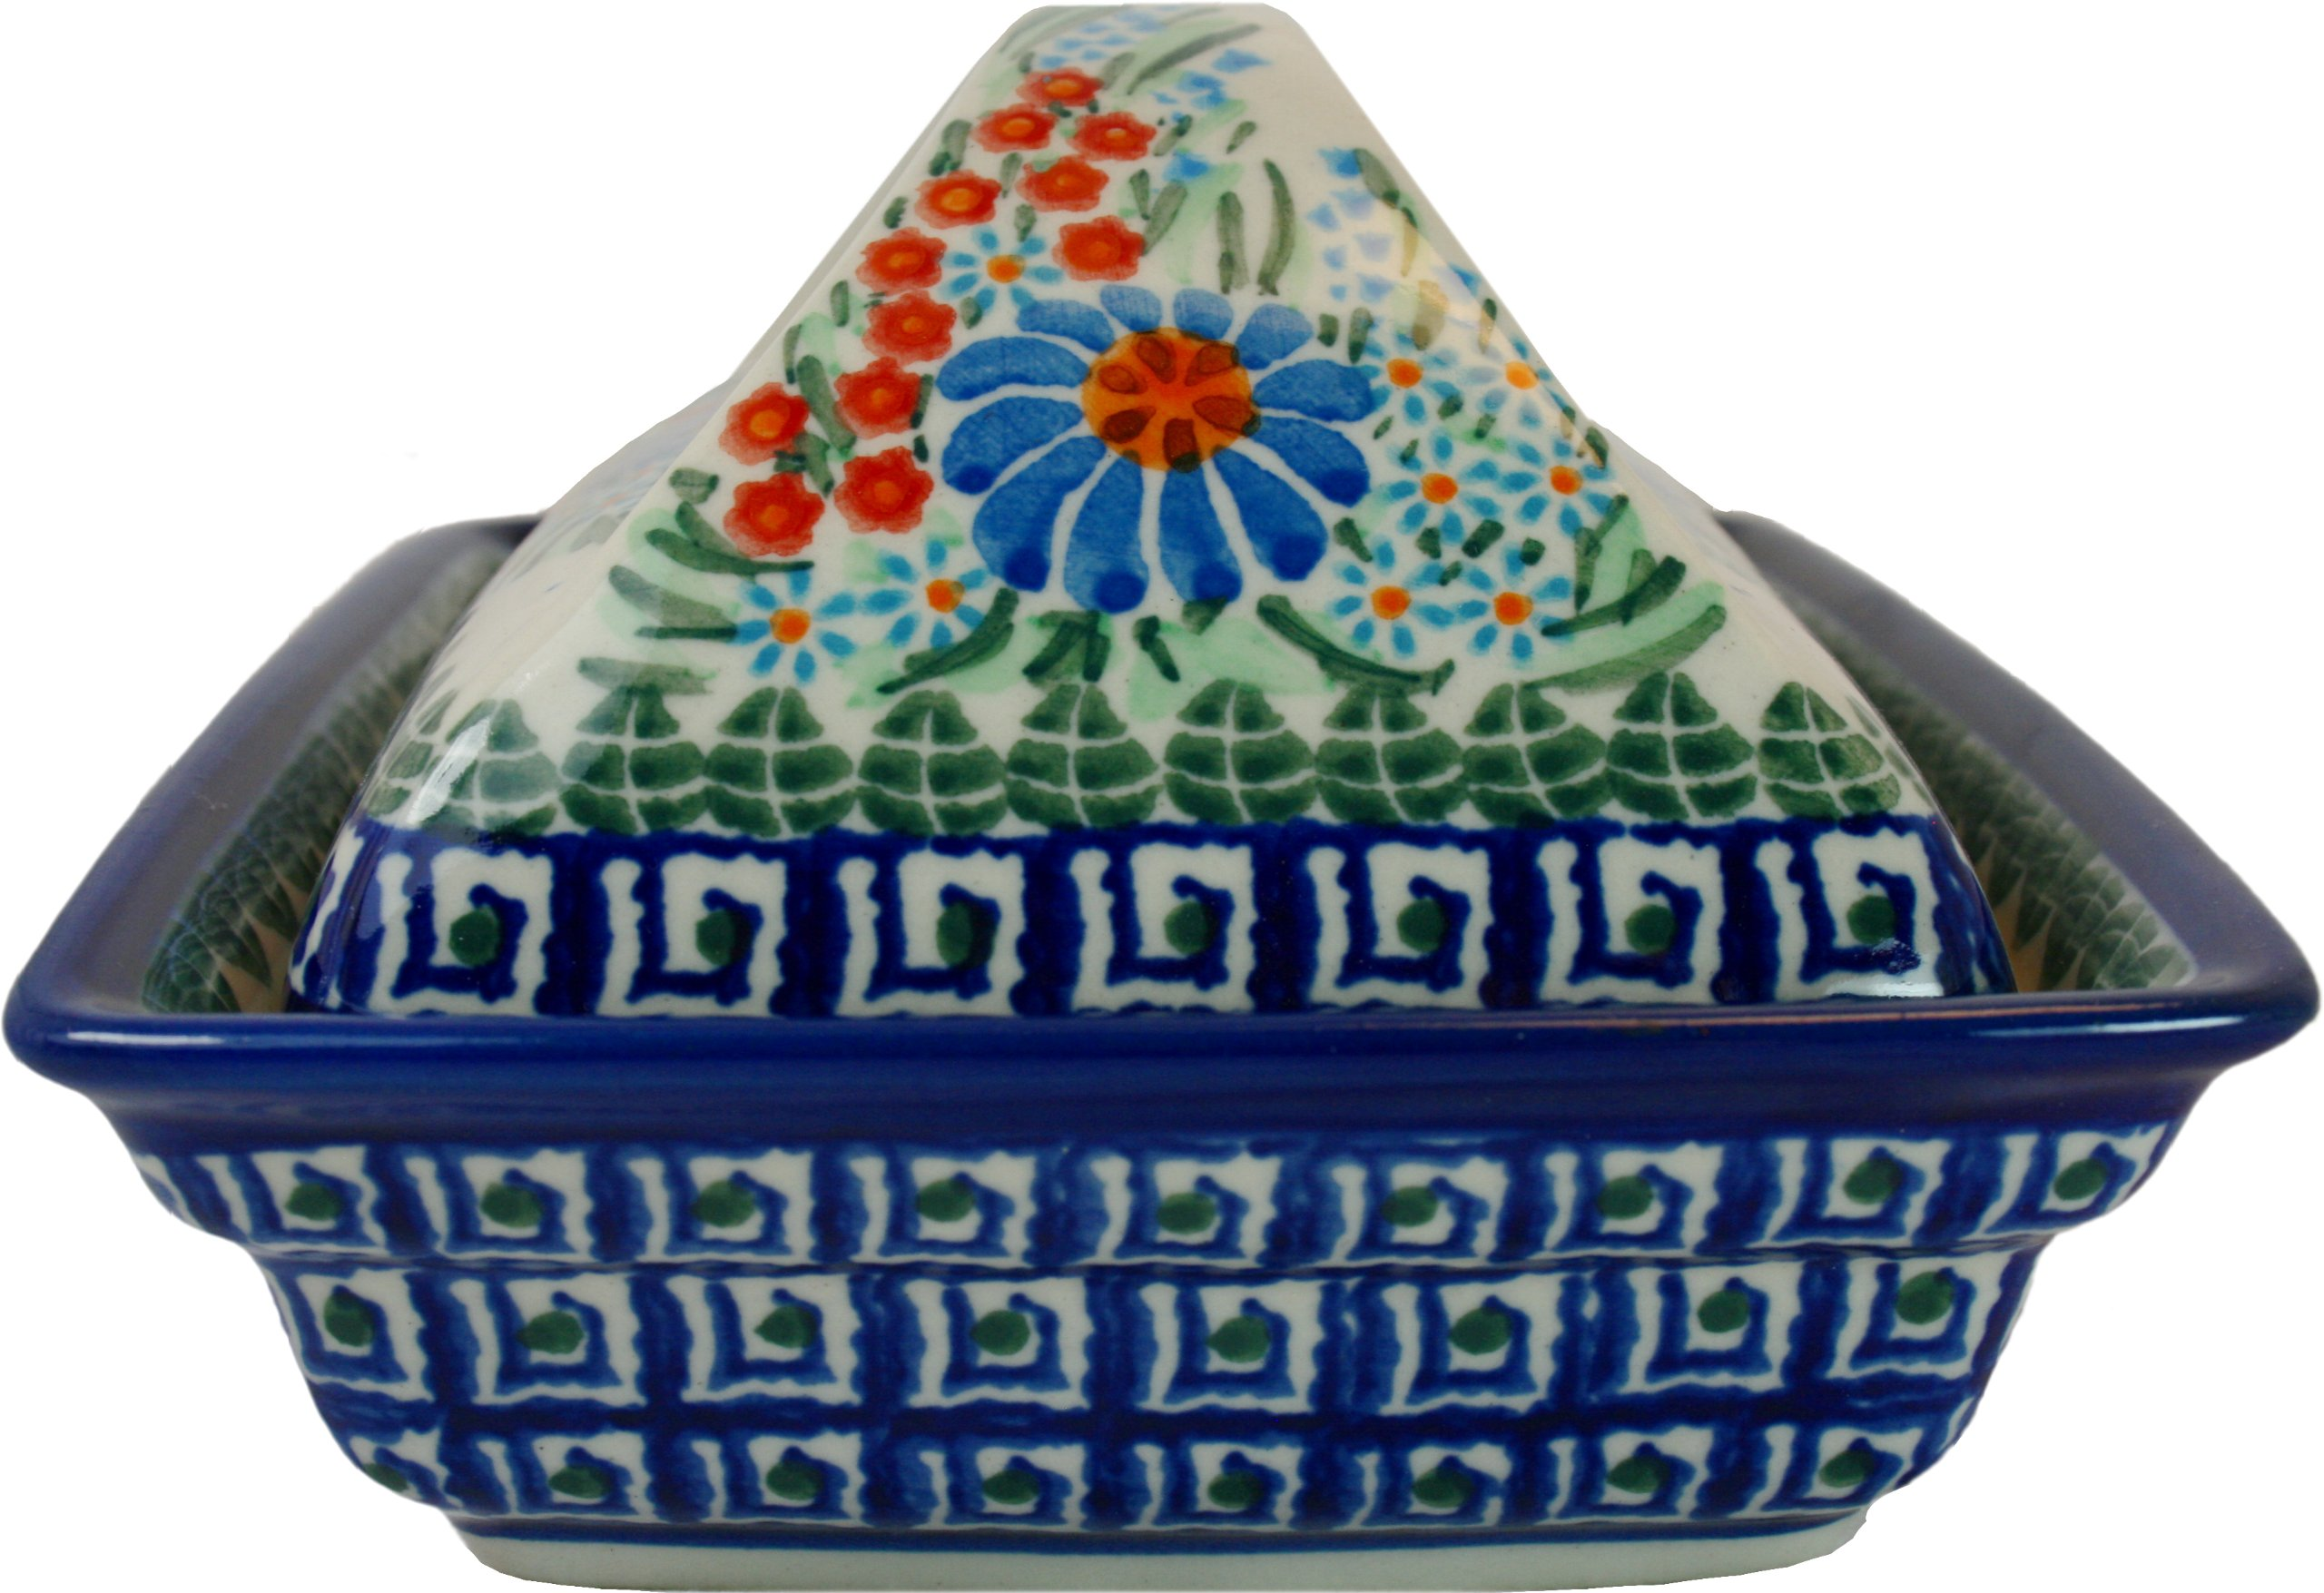 Polish Pottery Ceramika Boleslawiec 0352/169 Butter Deep Dish, 2 Cubes by Polish Pottery Ceramika Boleslawiec (Image #4)